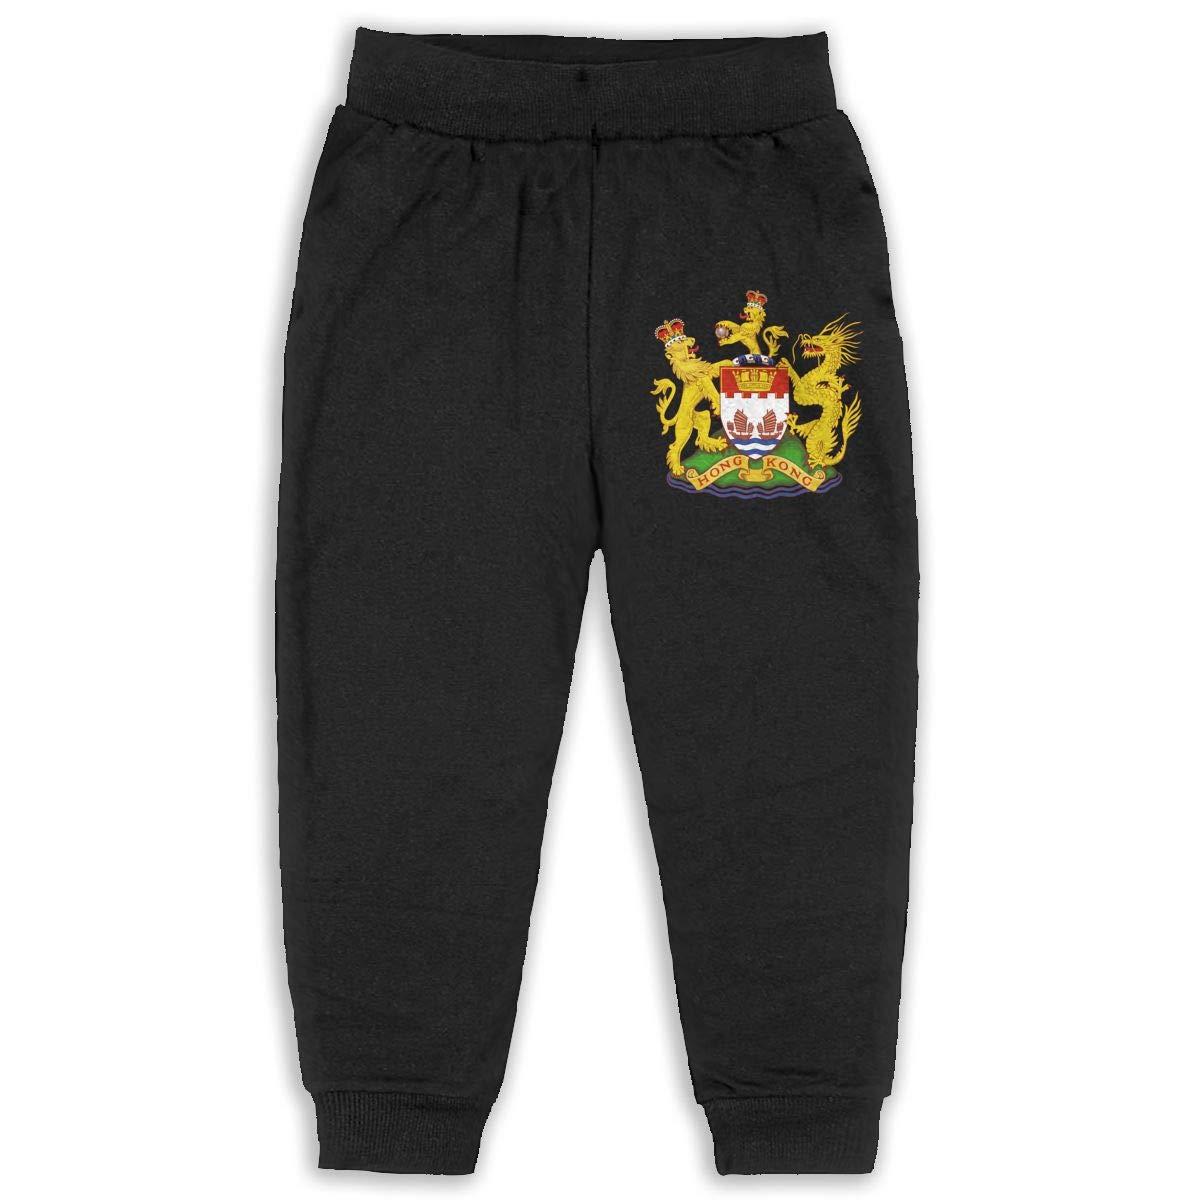 Coat of Arms of Hong Kong Children Cartoon Printed Soft Elastic Sweatpants Sport Jogger Active Pants